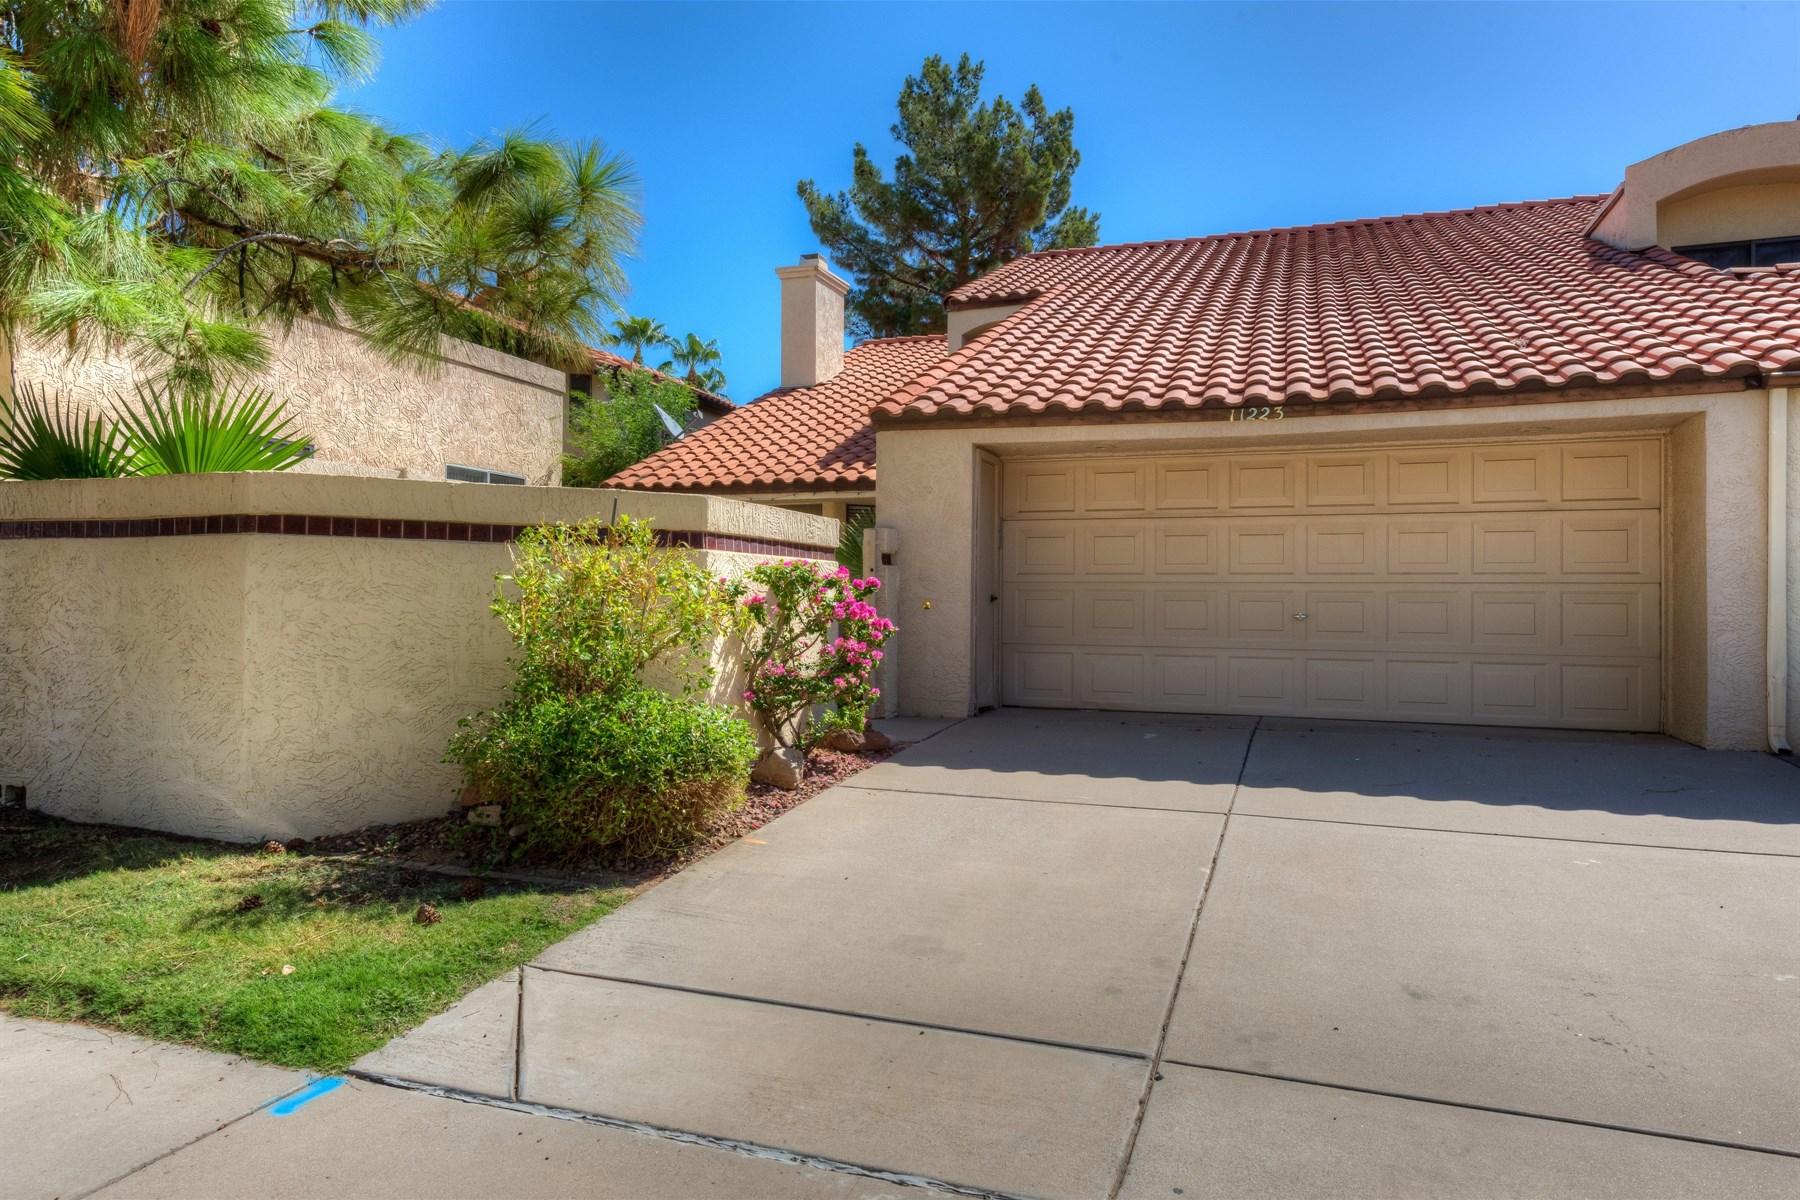 Konak için Satış at Remodeled home in Scottsdale 11223 N 109th Pl Scottsdale, Arizona, 85259 Amerika Birleşik Devletleri